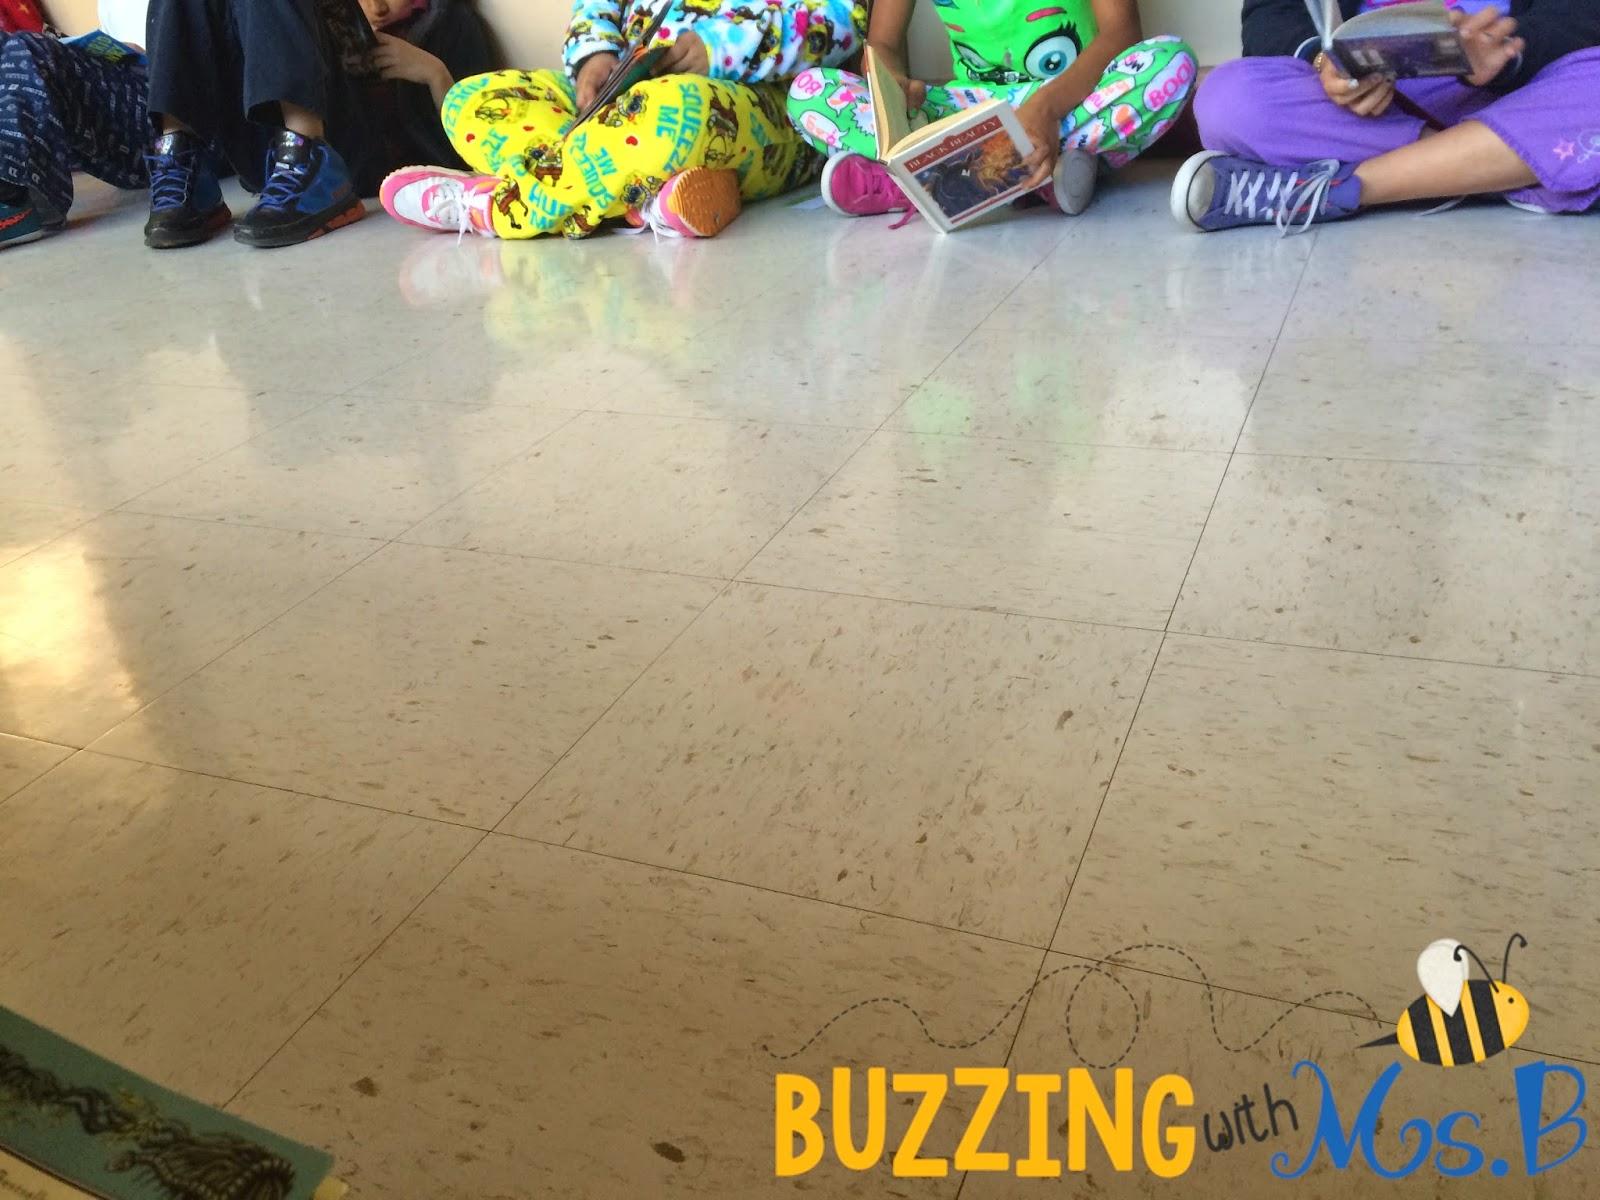 http://buzzingwithmsb.blogspot.com/2015/03/read-across-america-celebration-fun.html